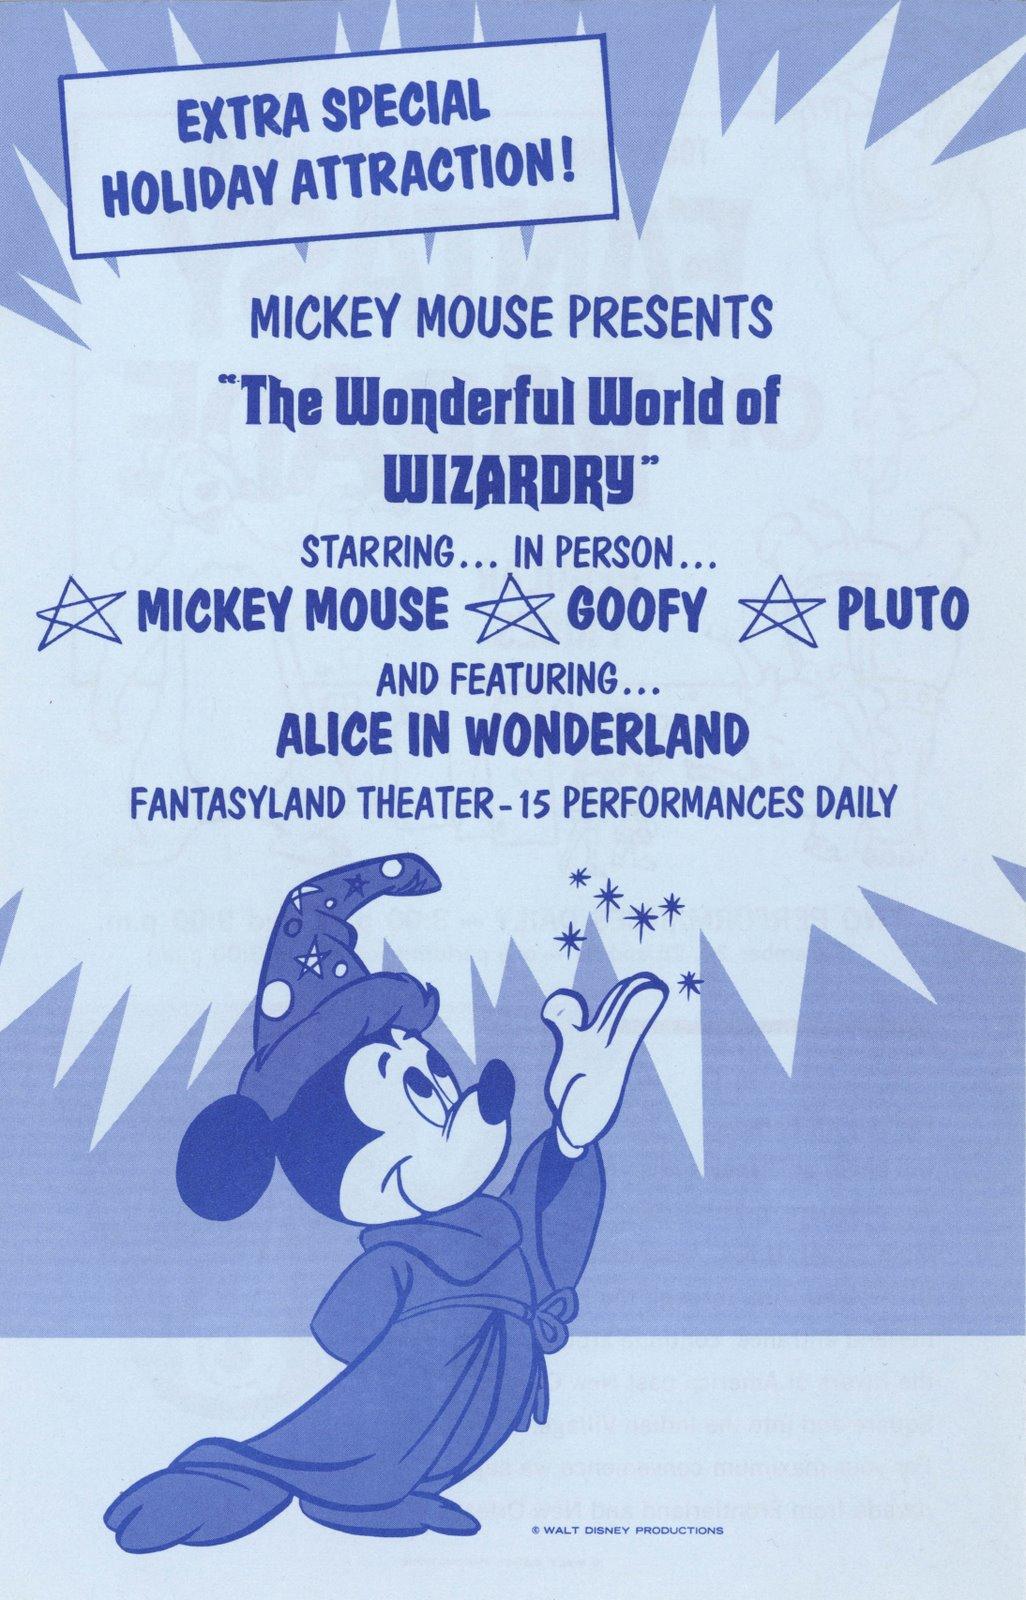 The Wonderful World of Wizardry